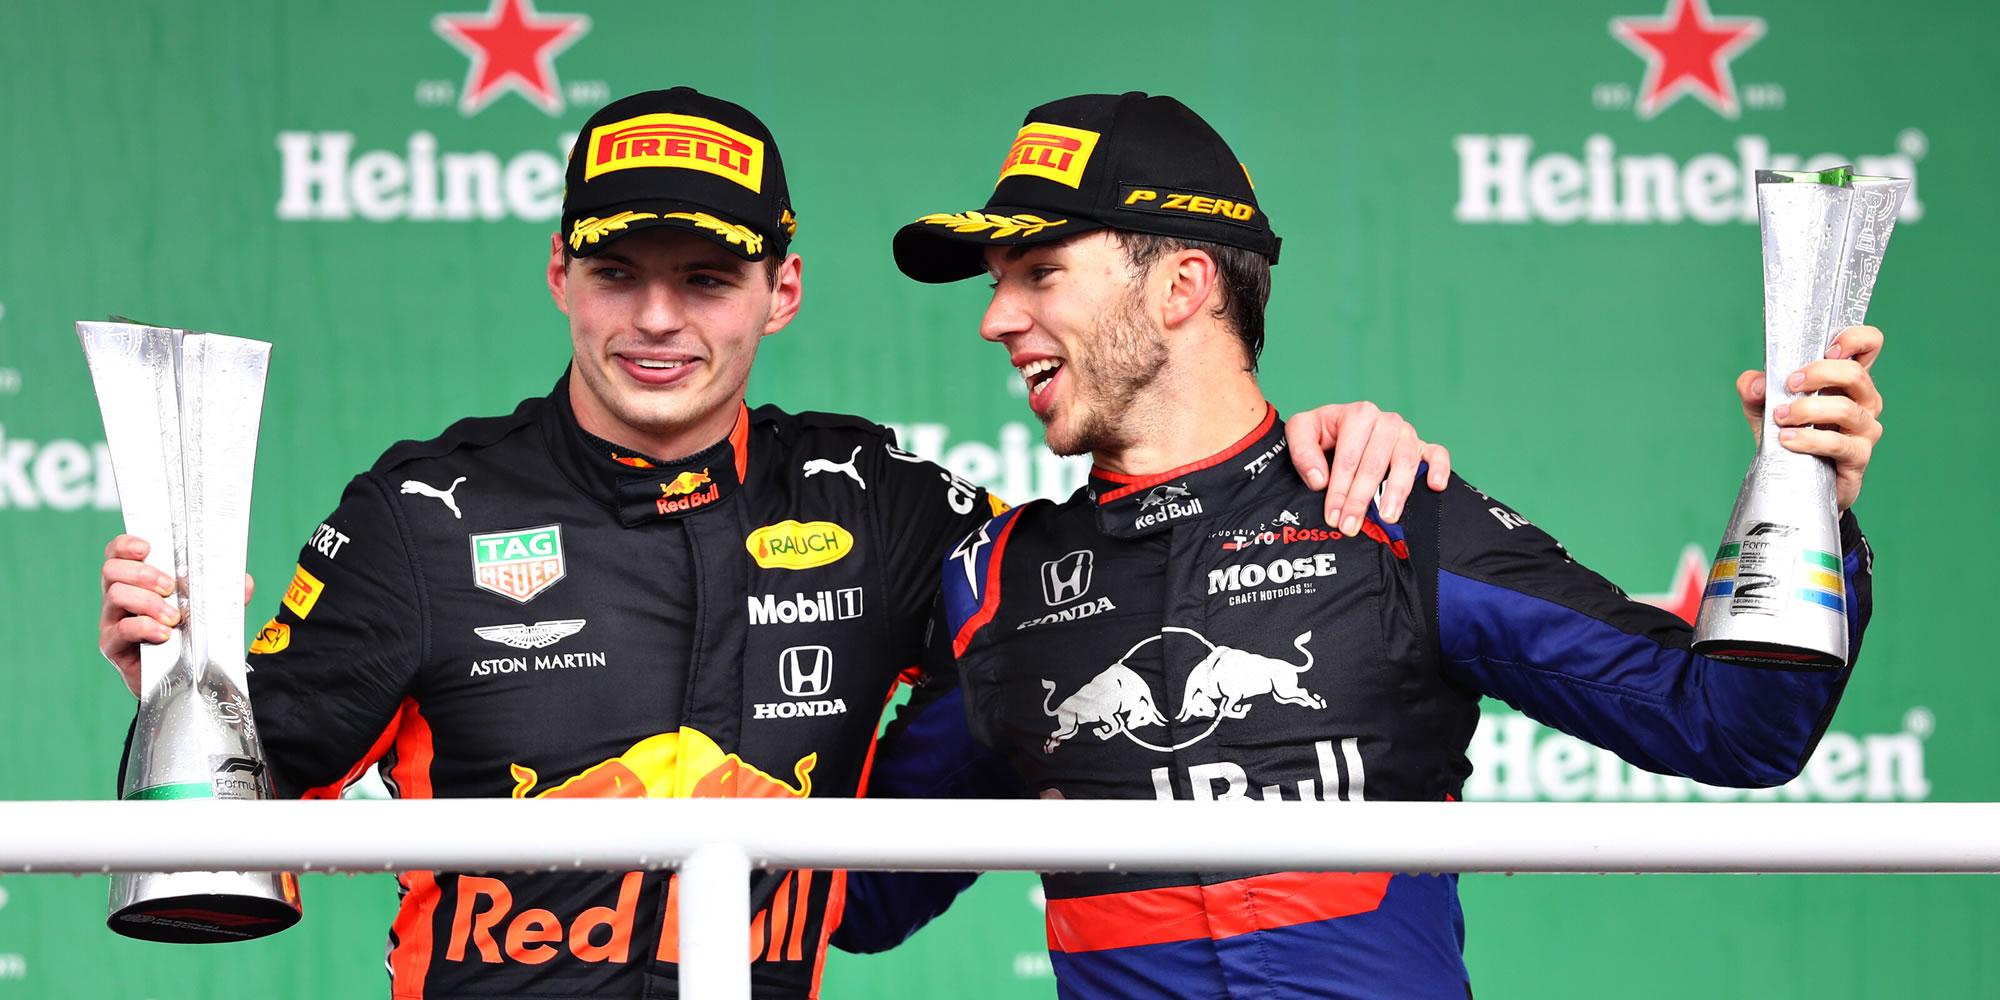 Brazil GP 2019 – Podium! 1